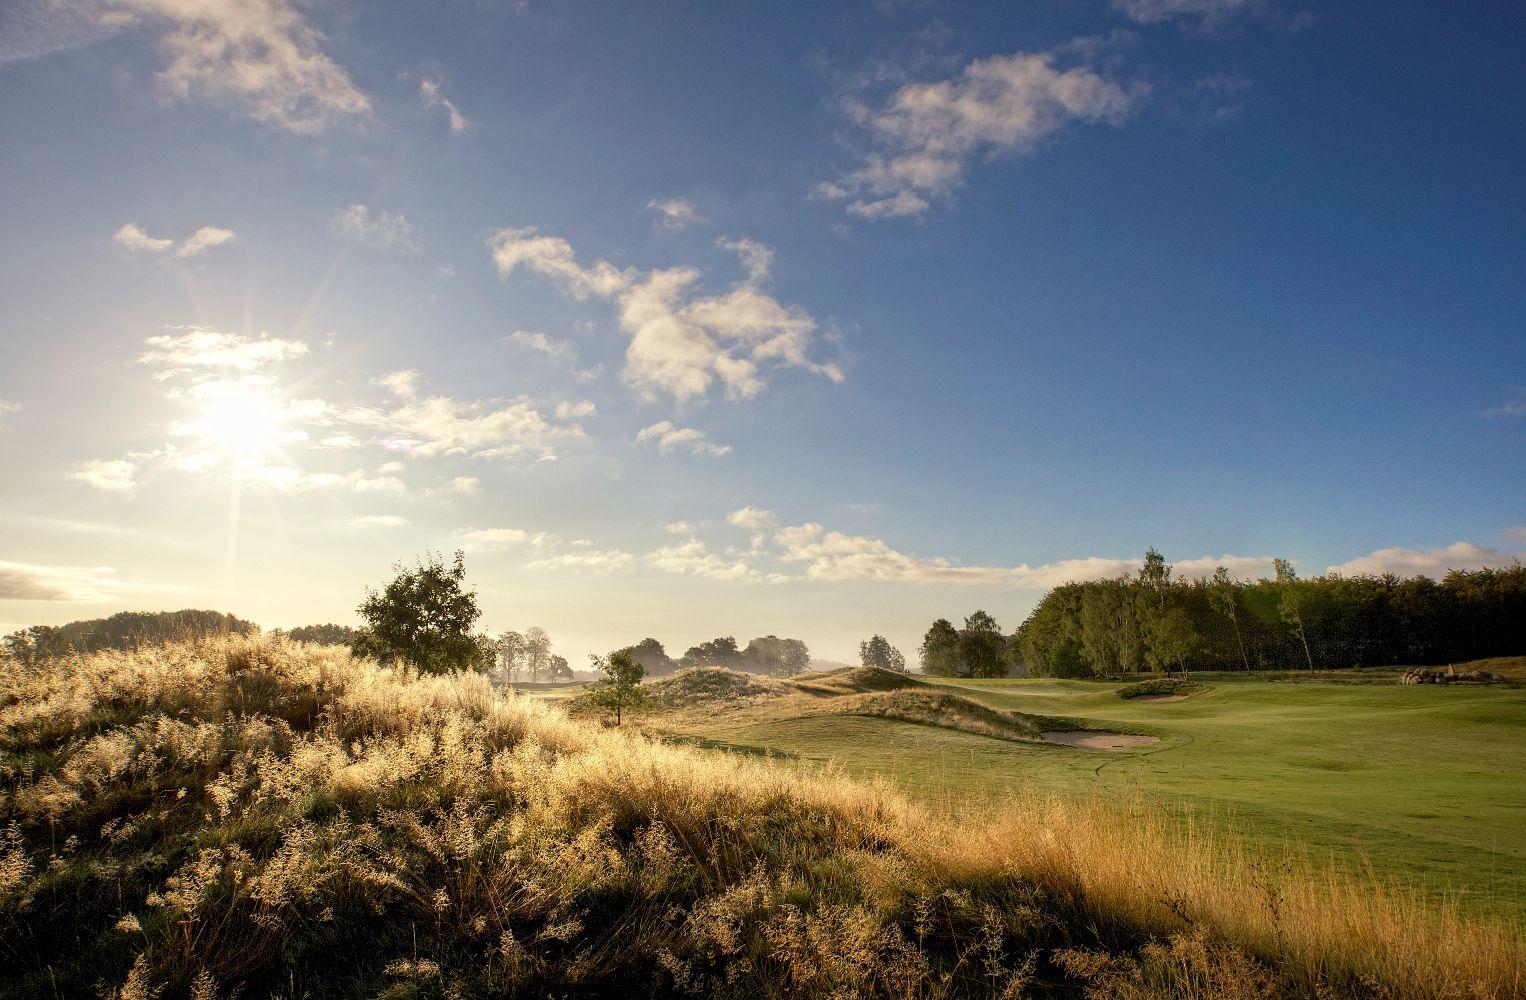 Vasatorps golfklubb cover picture